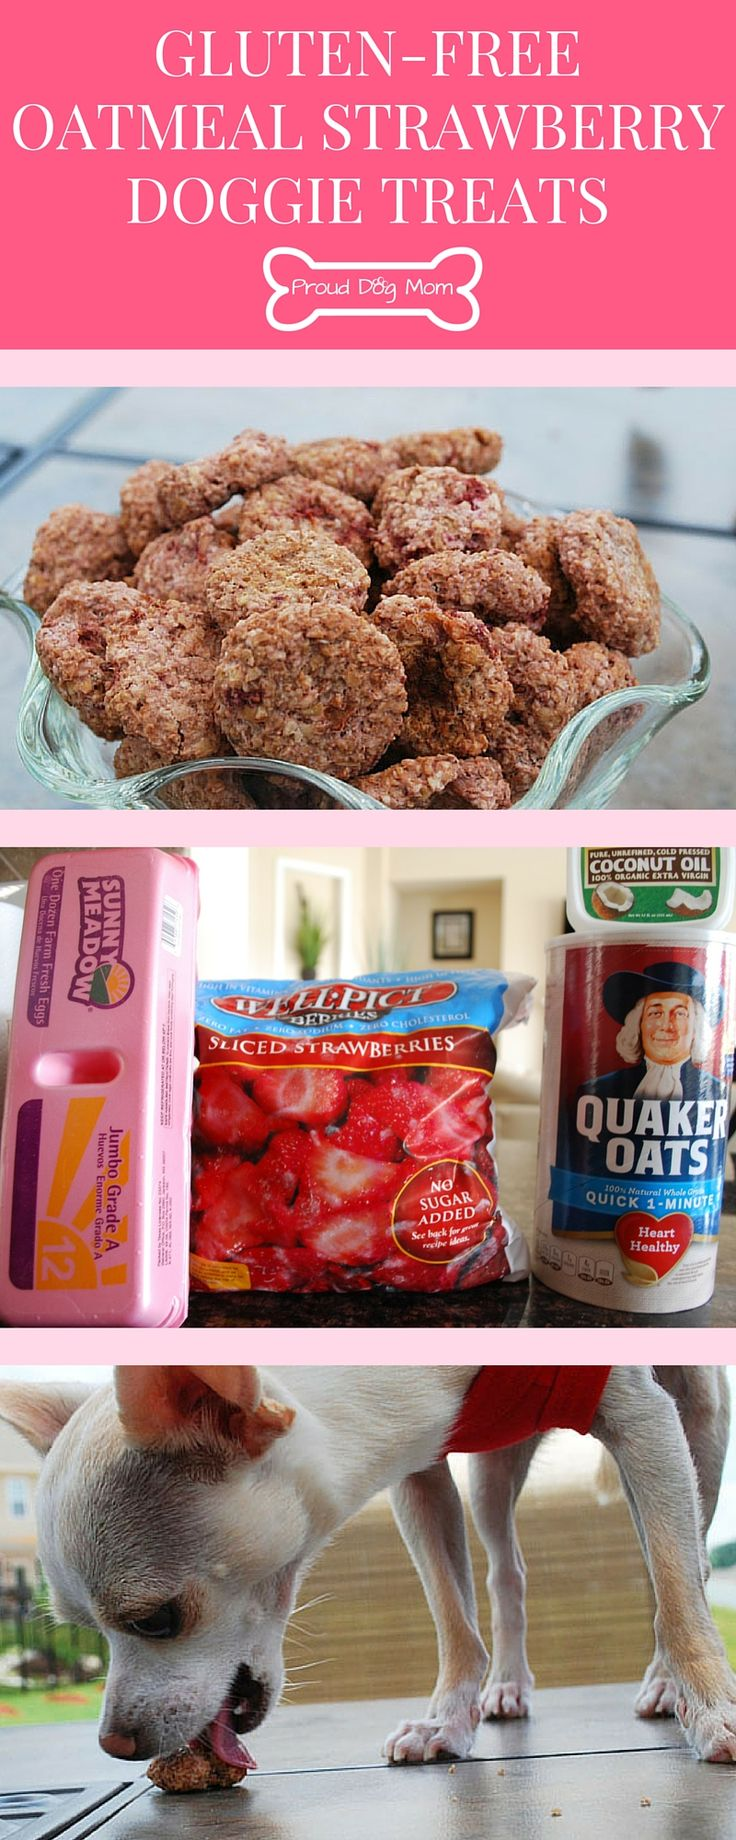 Gluten-Free Oatmeal Strawberry Doggie Treats | Homemade Healthy Dog Treats | DIY Dog Treats | Gluten-Free Recipes |